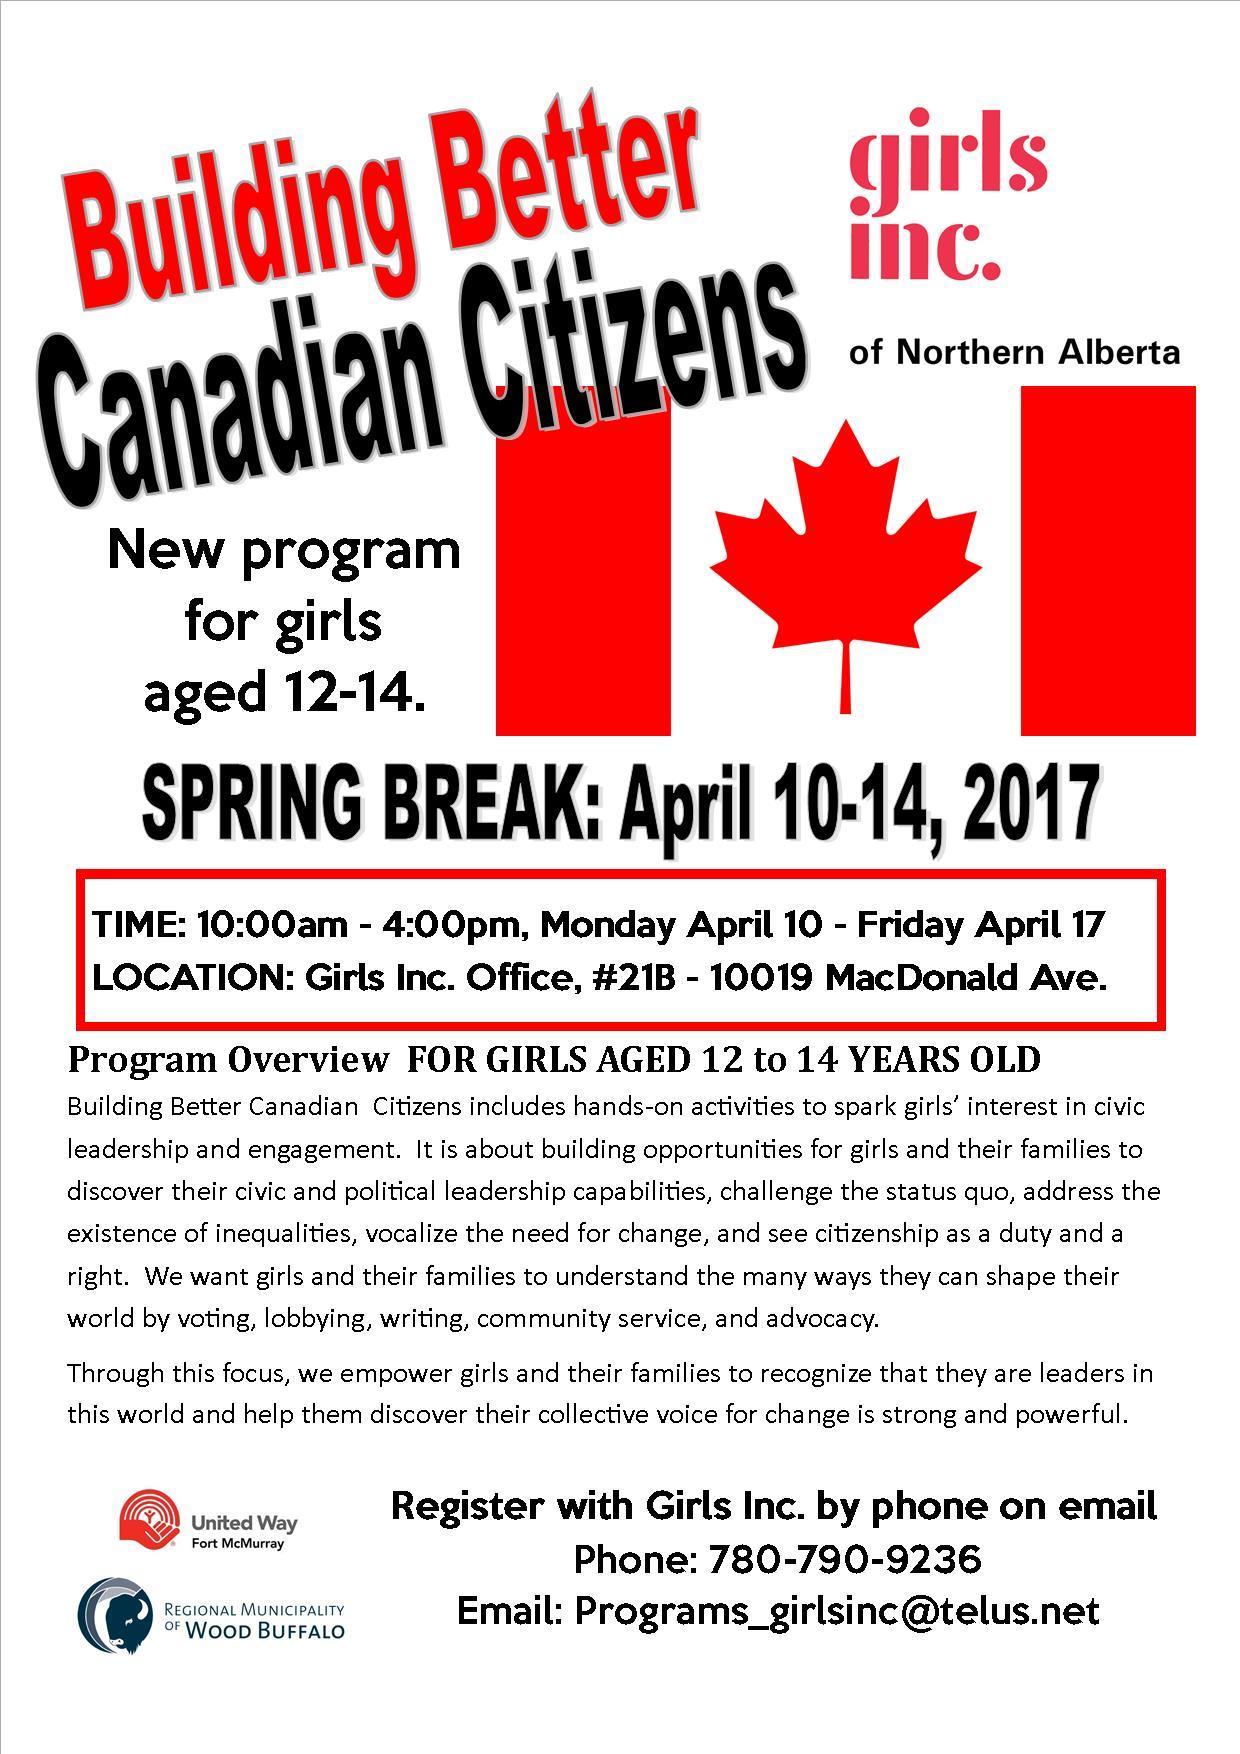 Building Better Canadian Citizens - Program Poster